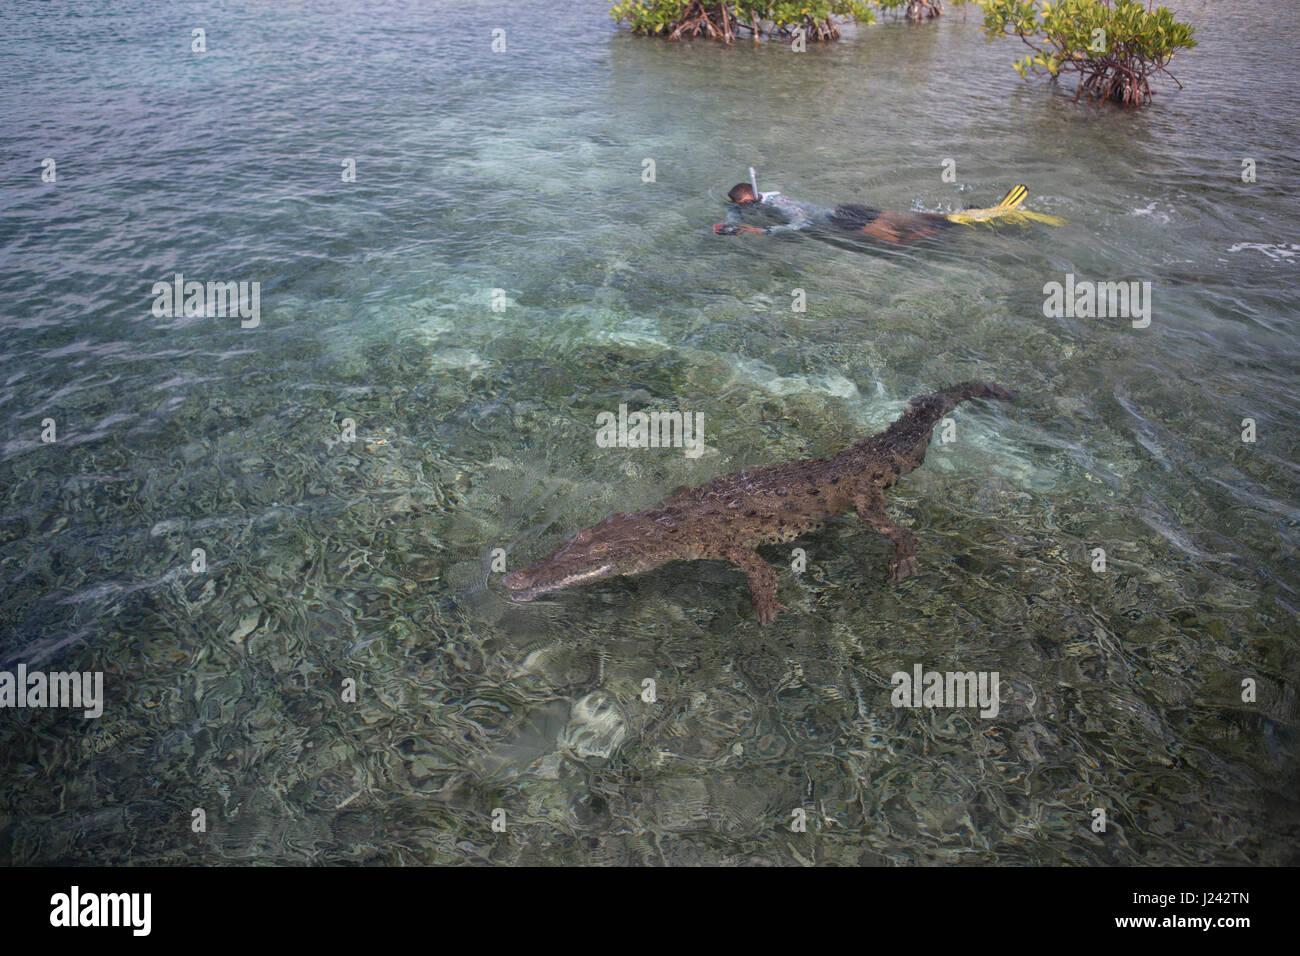 Schnorchler schwimmt mit Krokodil, Kuba Stockbild